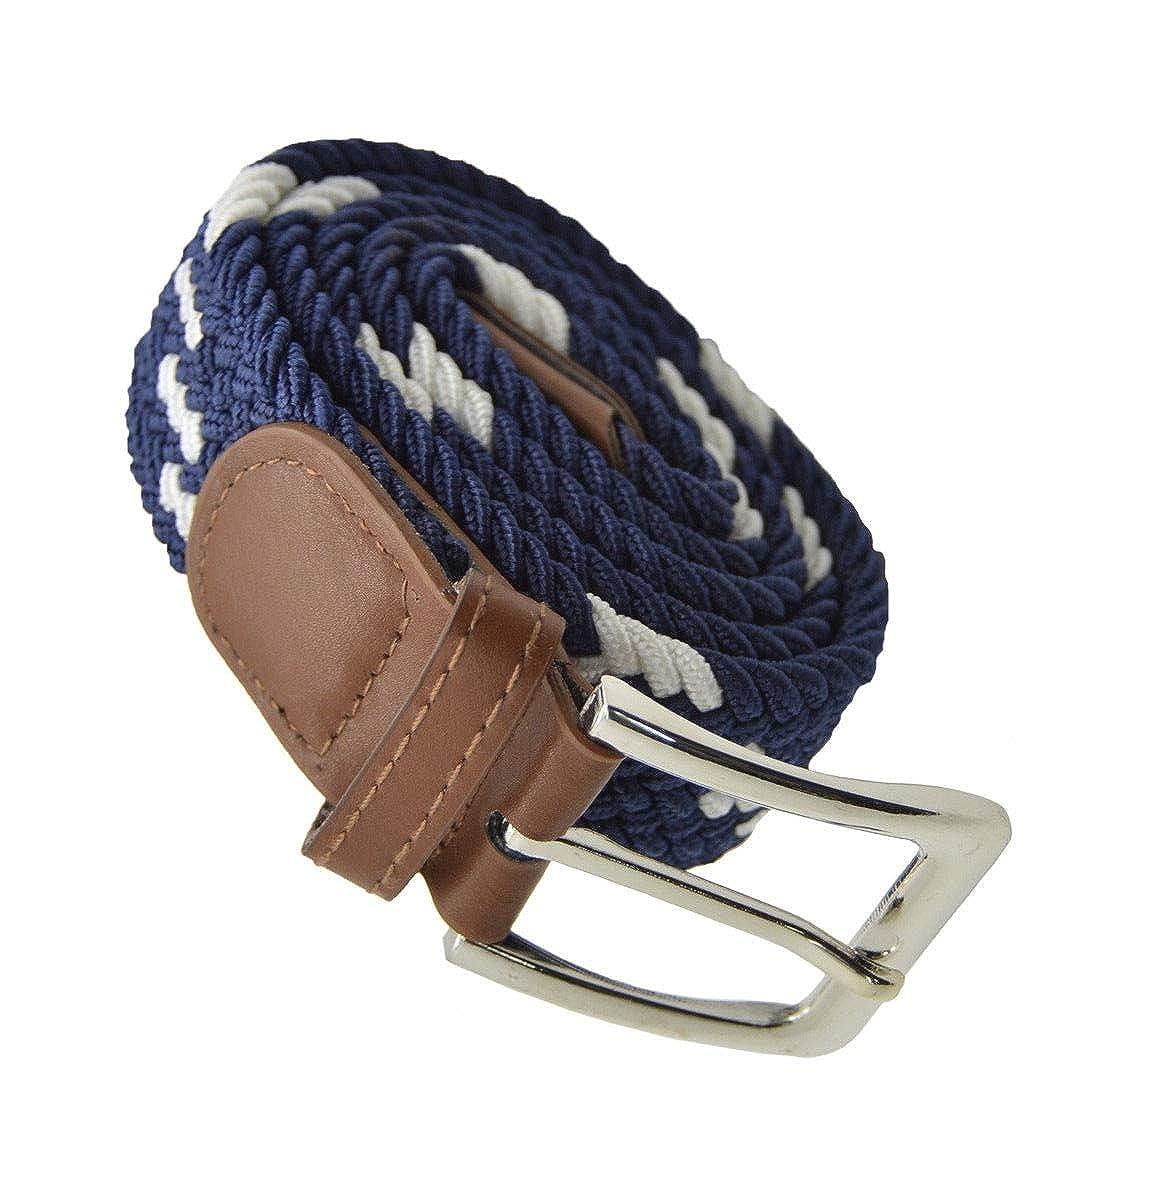 Stylish Men Elastic Expandable Braided Fabric Woven Stretch Belt 44 White//Navy #AAAS